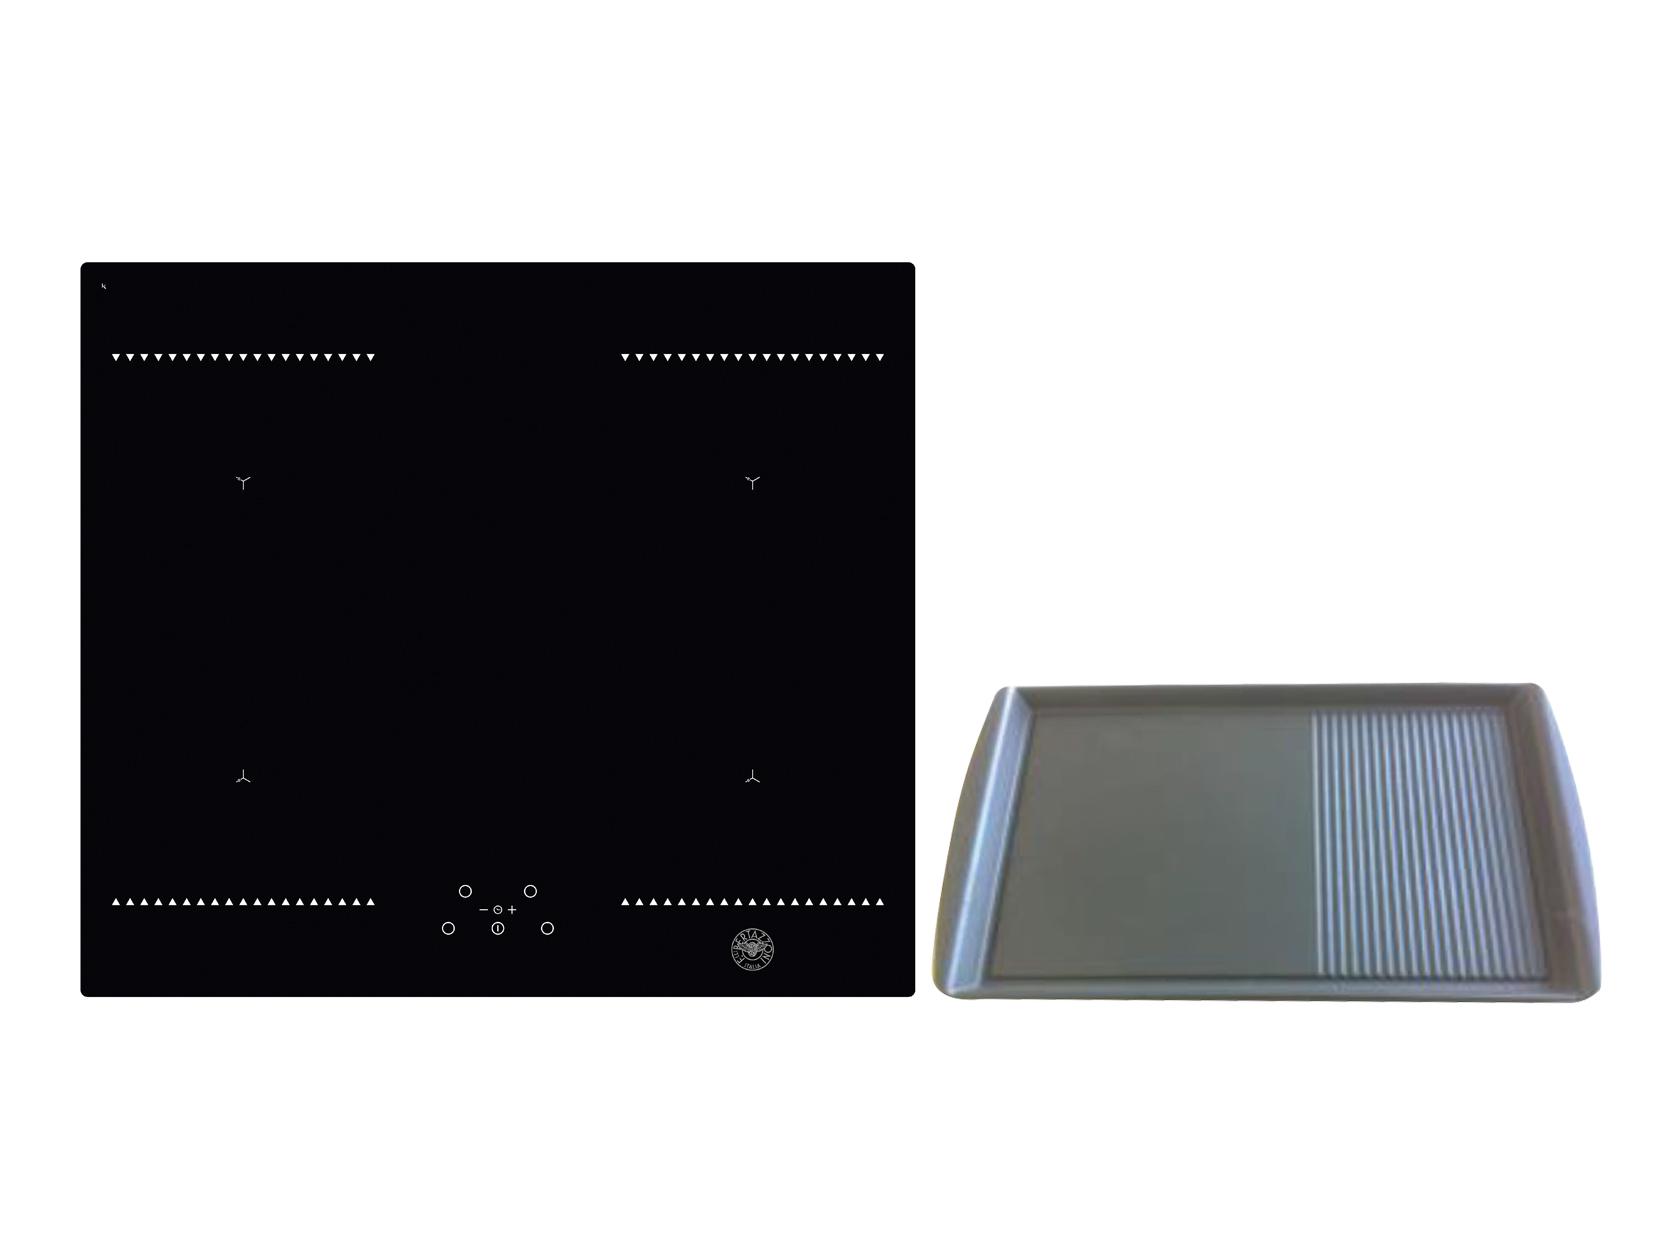 60cm Induction Hob, 4 Cooking Zones And 1 Bridge + Grill | Bertazzoni   Nero